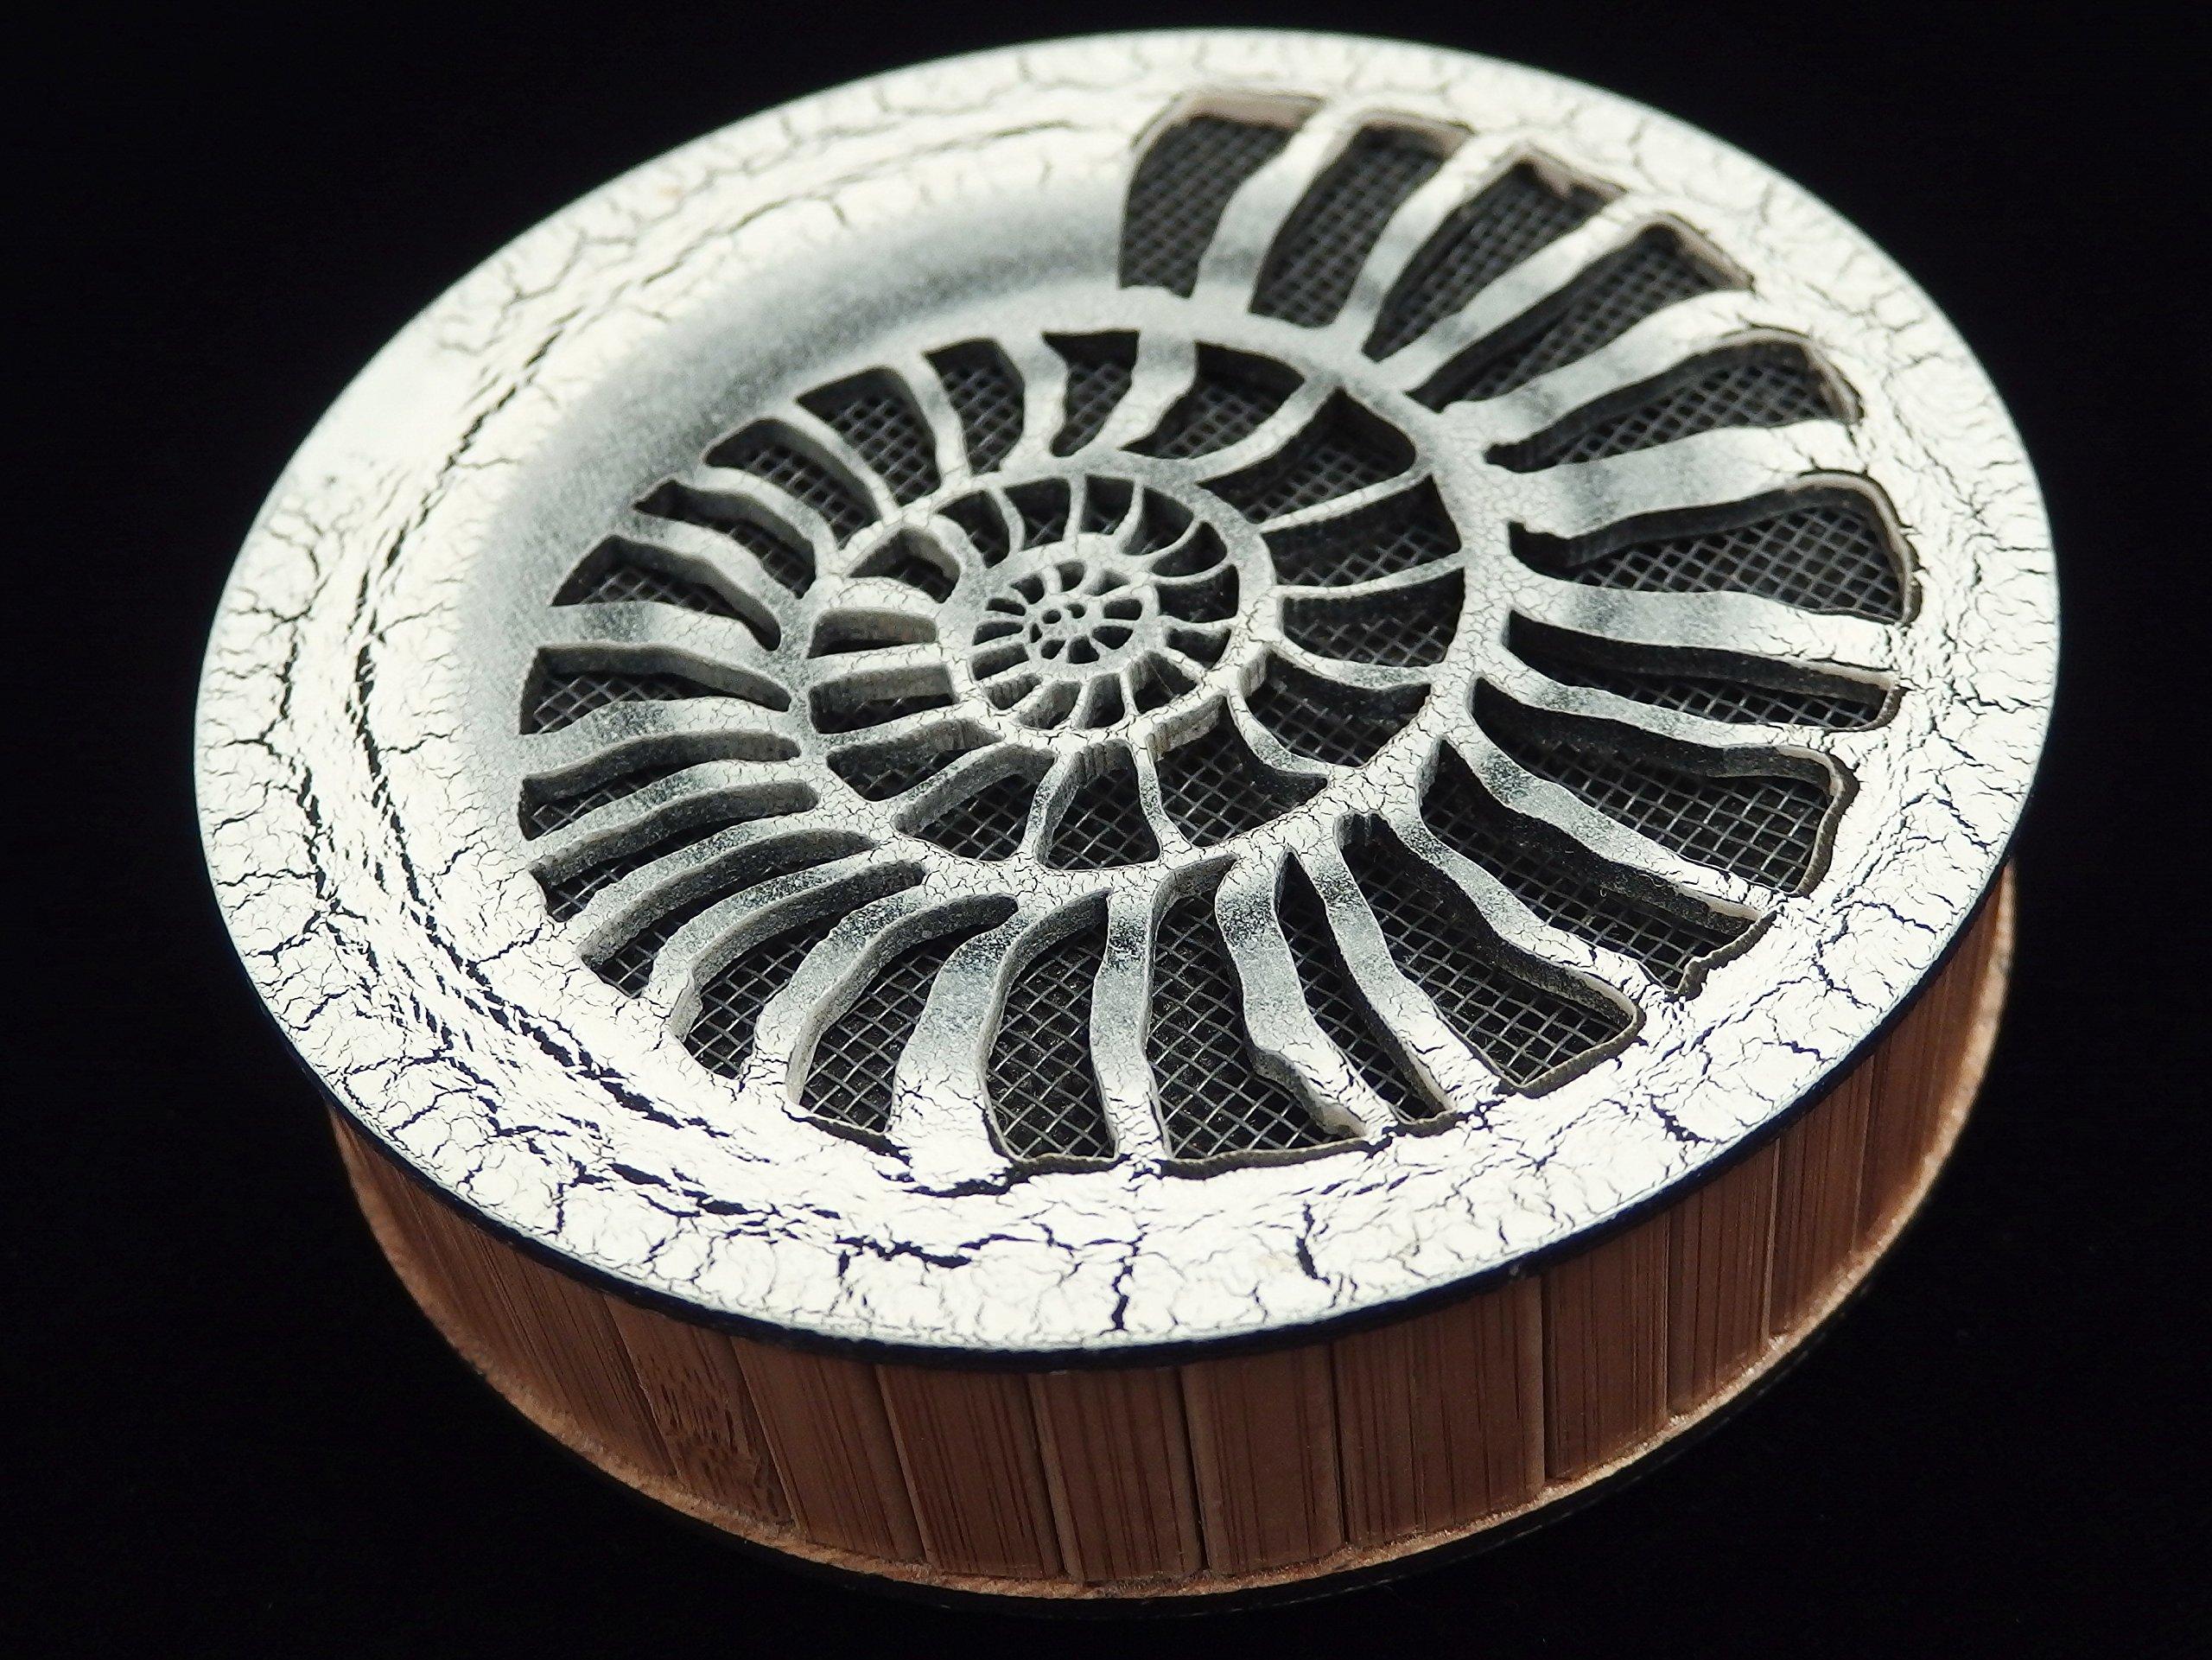 Sound of the stream 185 mm / Strumok (Ammonite) Great sound New Percussion Rainstick